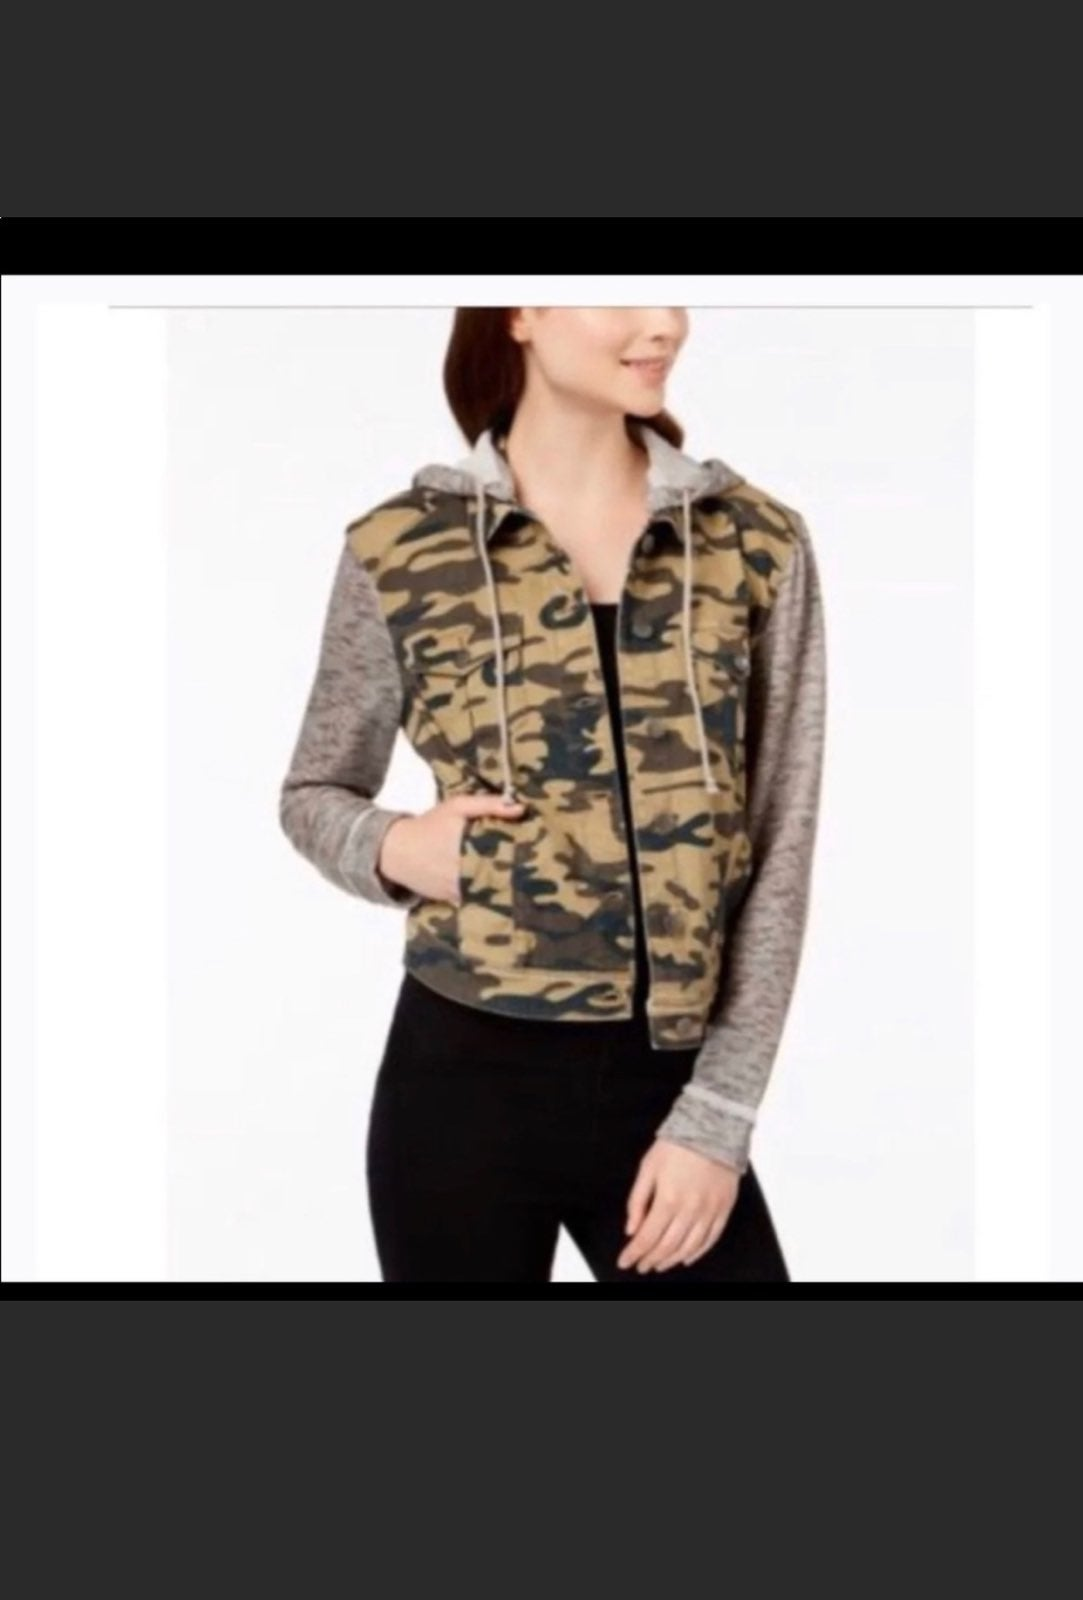 Tinseltown hooded jacket size large